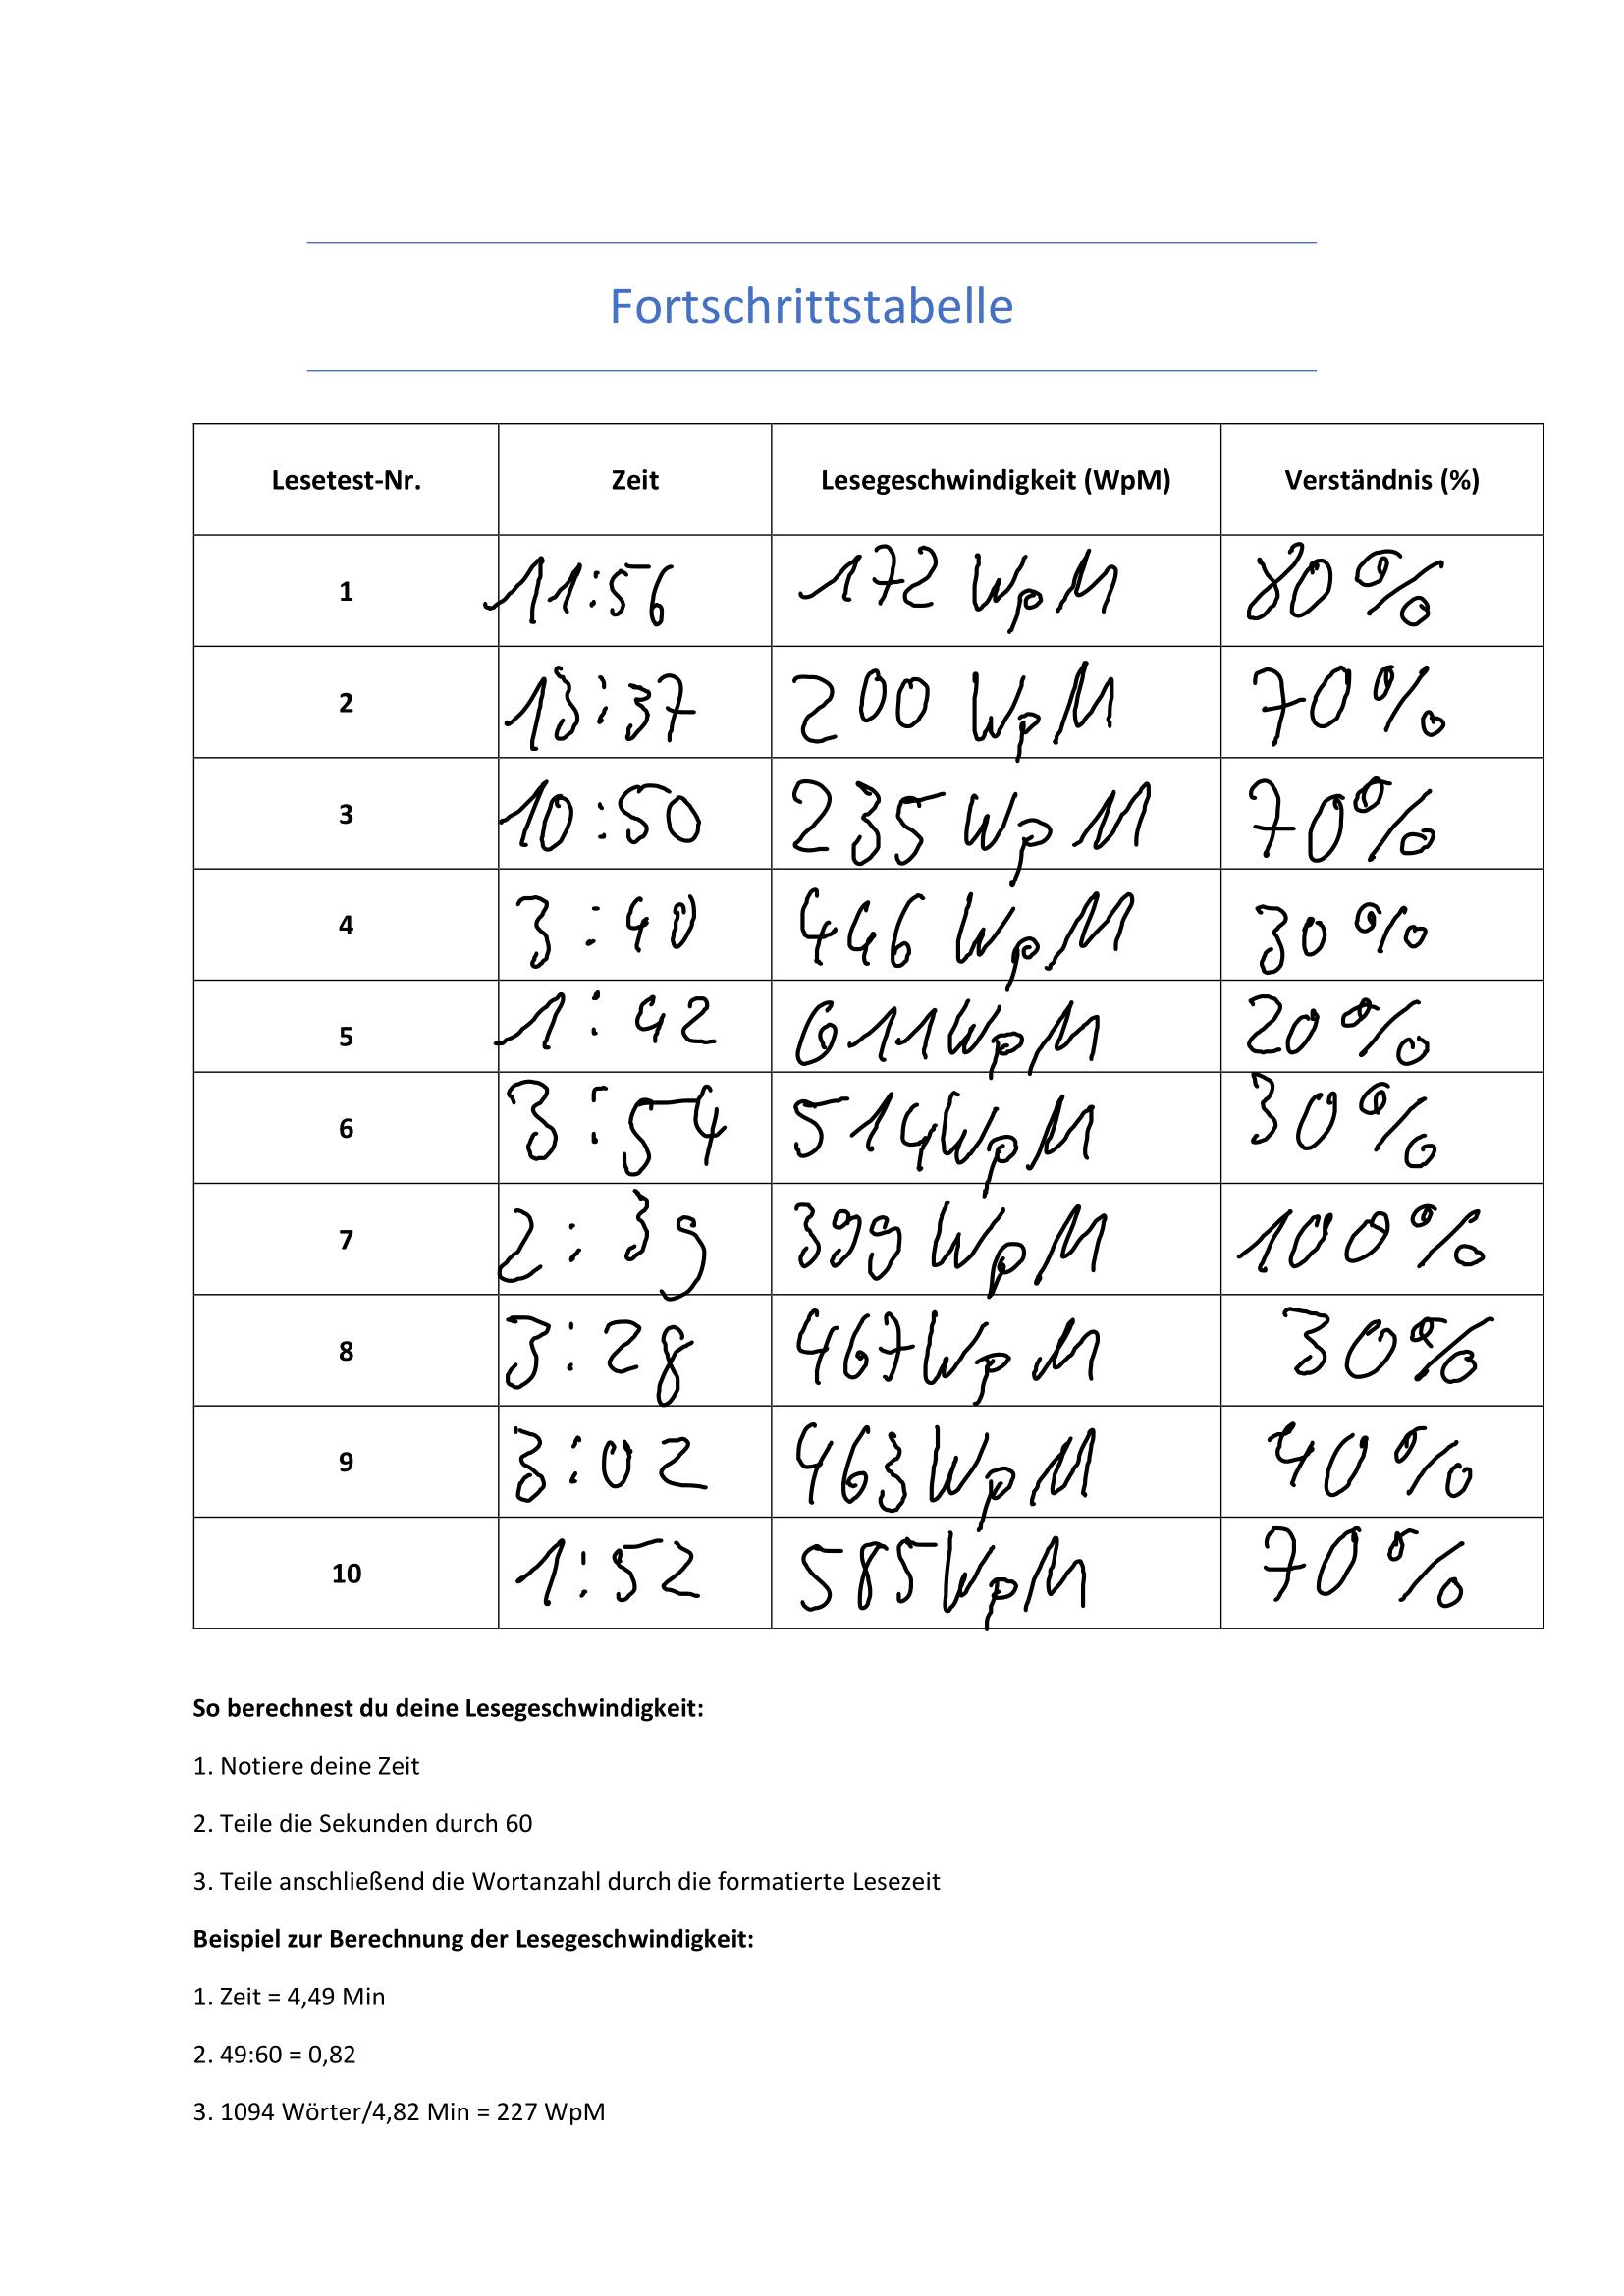 172 zu 585